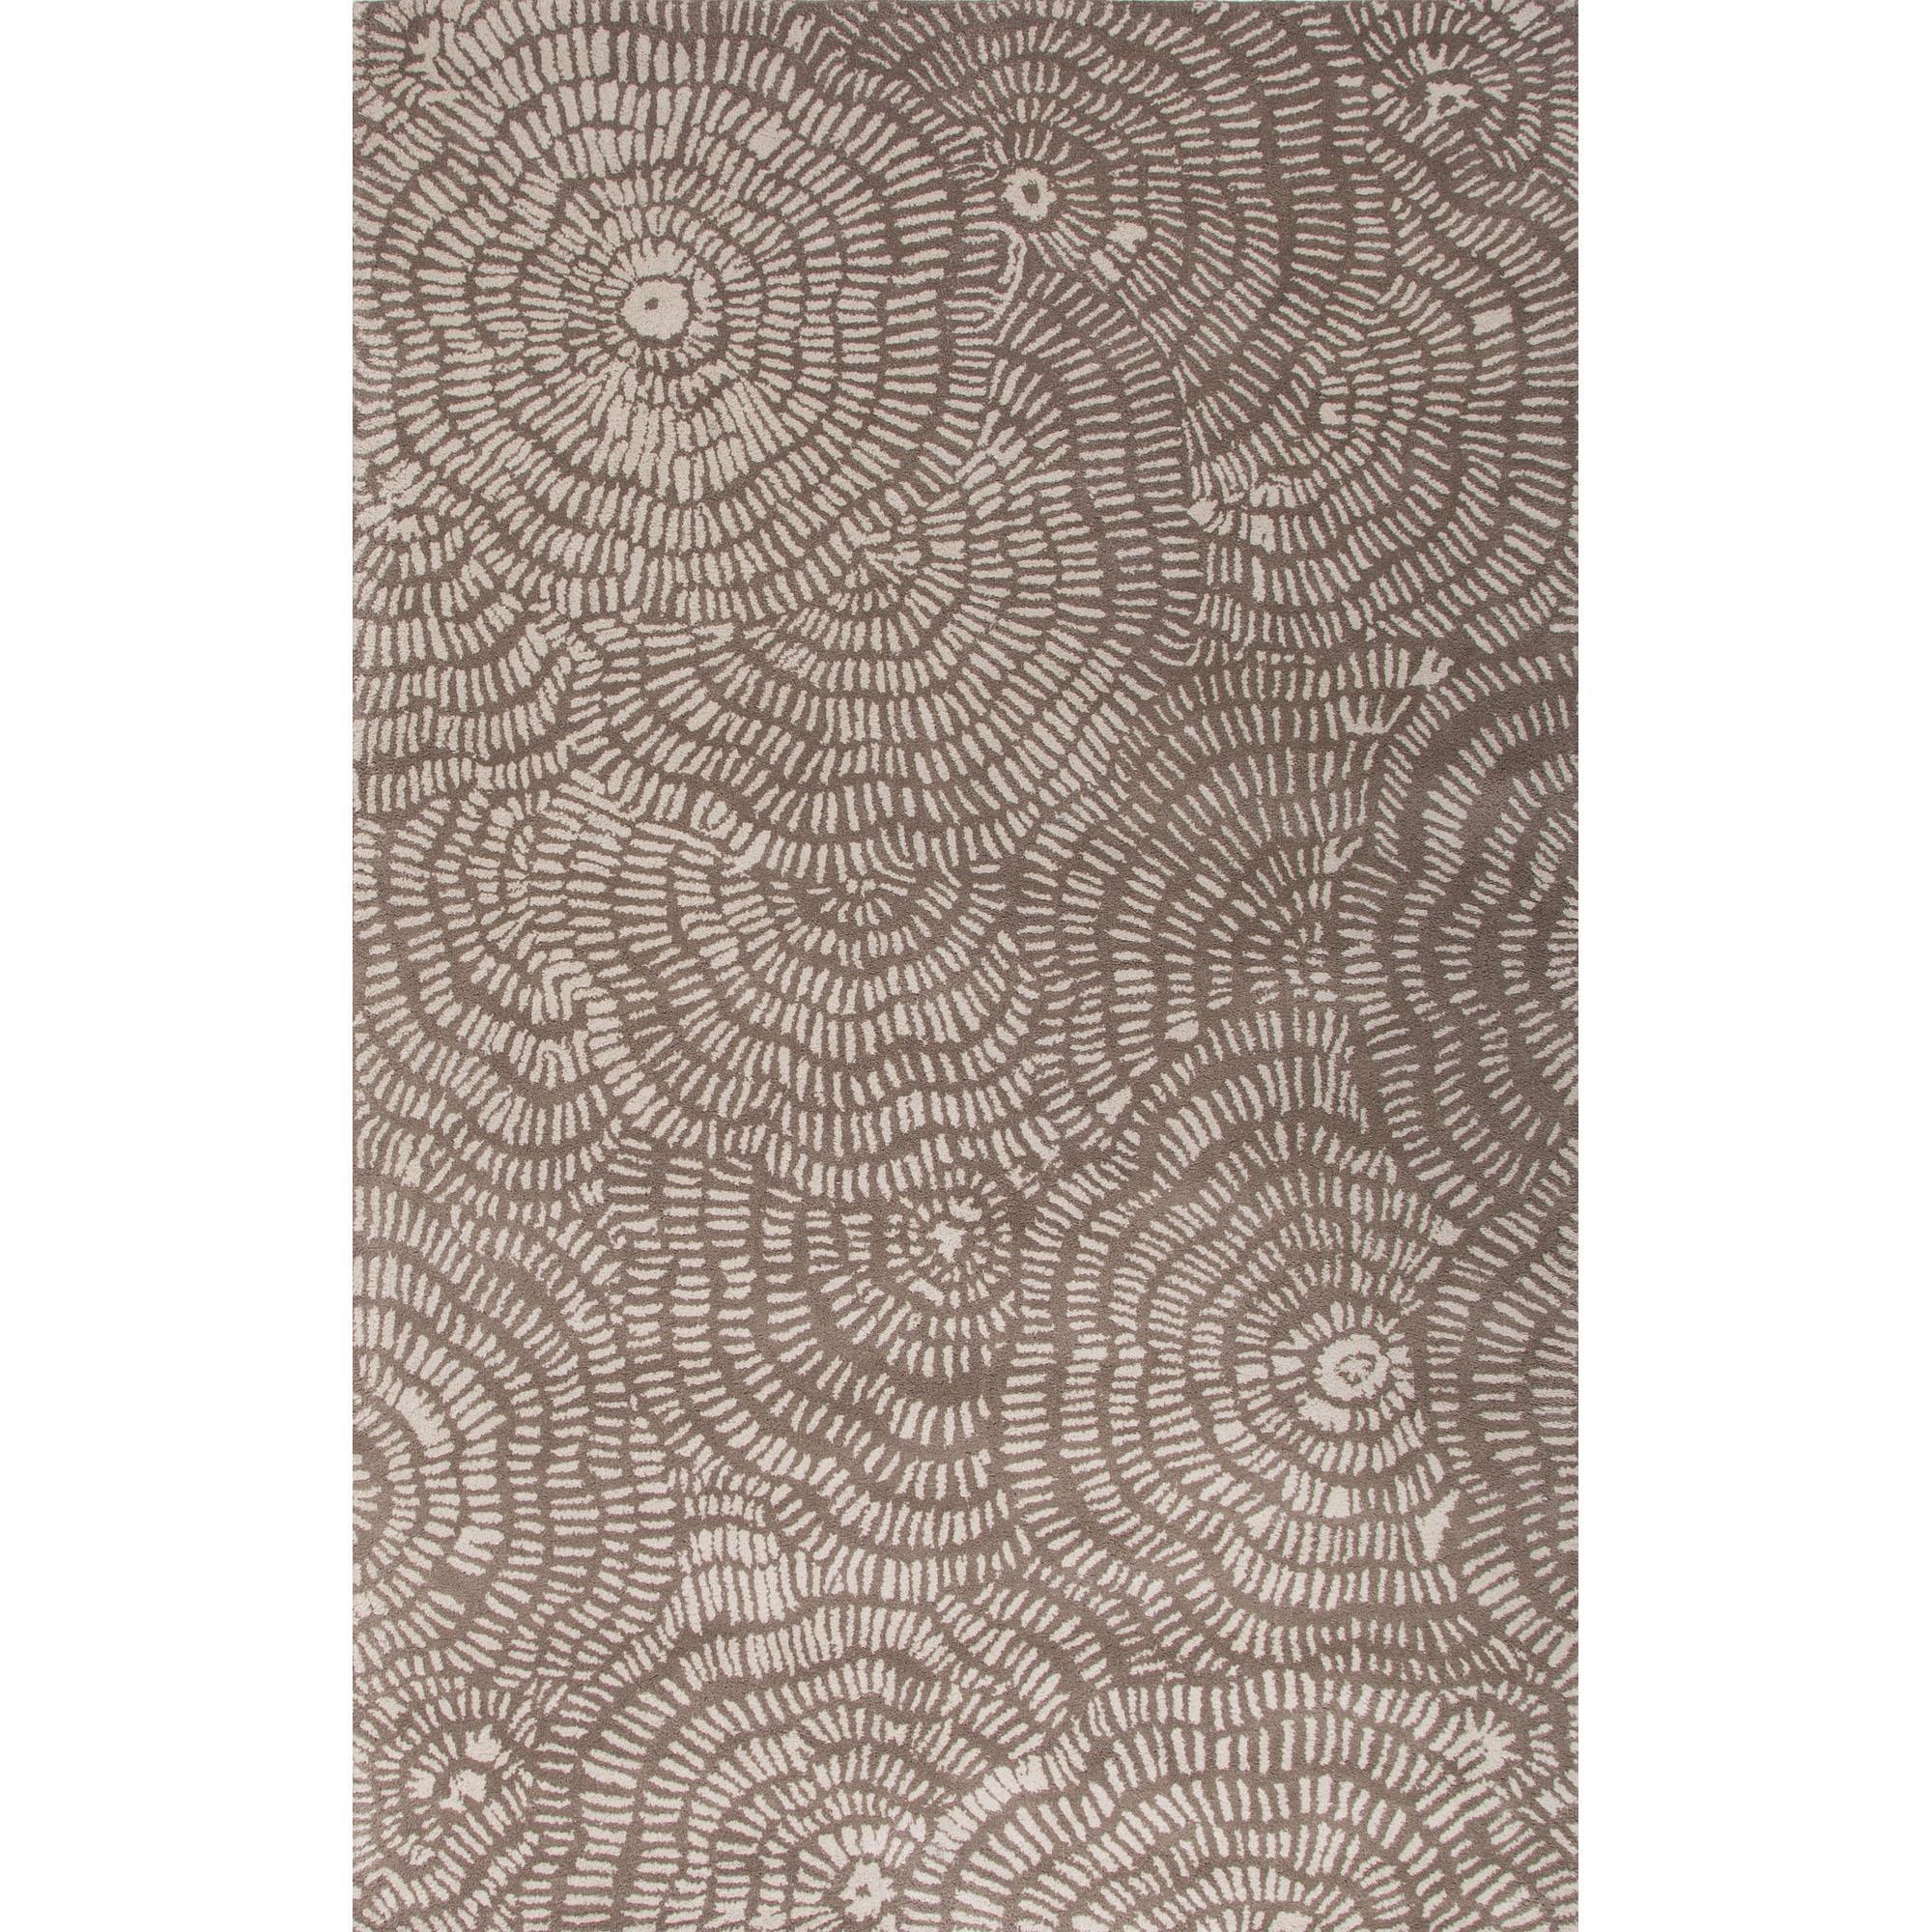 JAIPUR Rugs En Casa By Luli Sanchez Tufted 2 x 3 Rug - Item Number: RUG116816